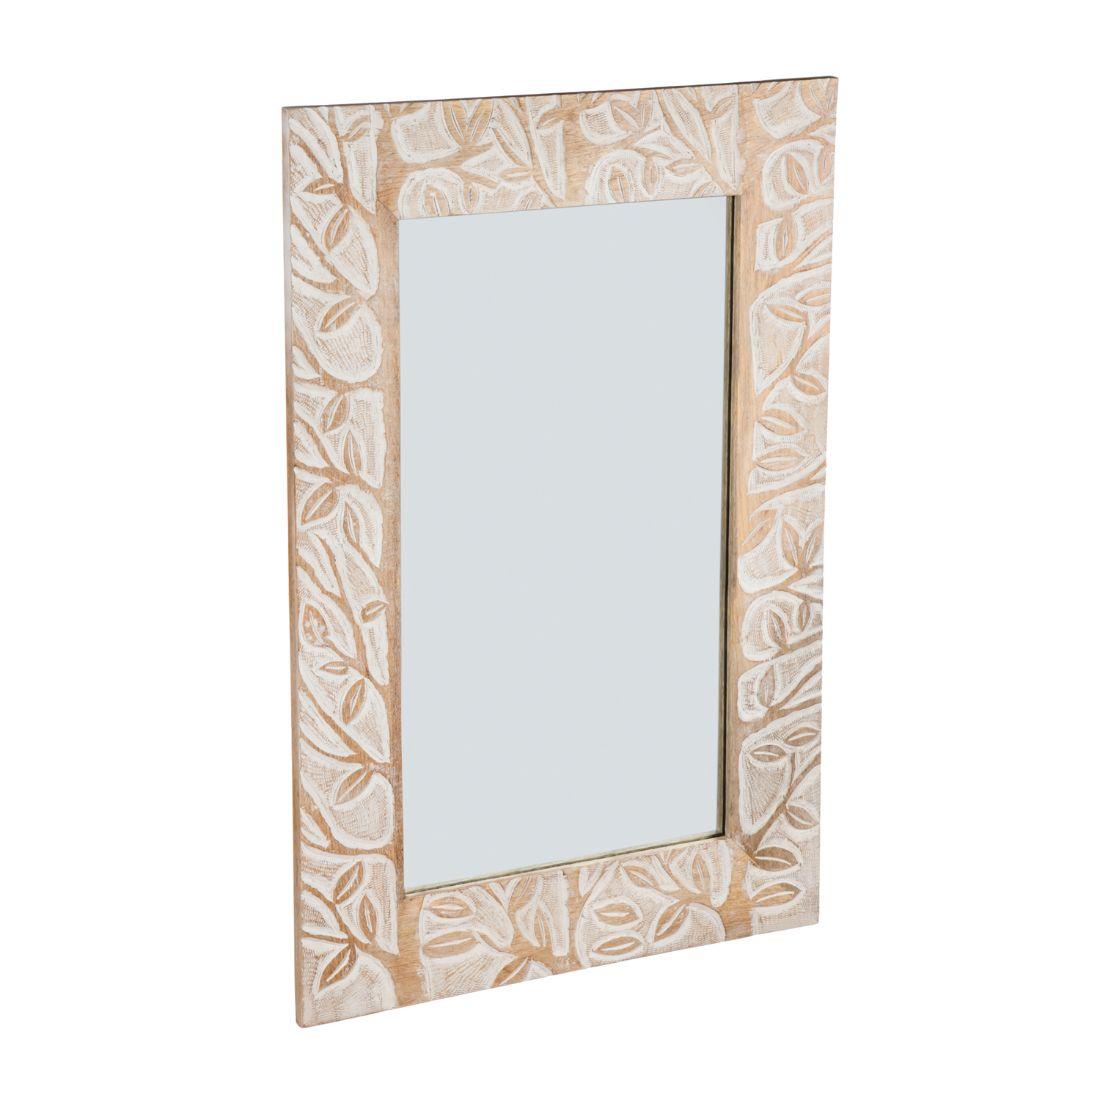 Hand-Carved Mango Wood Wall Mirror